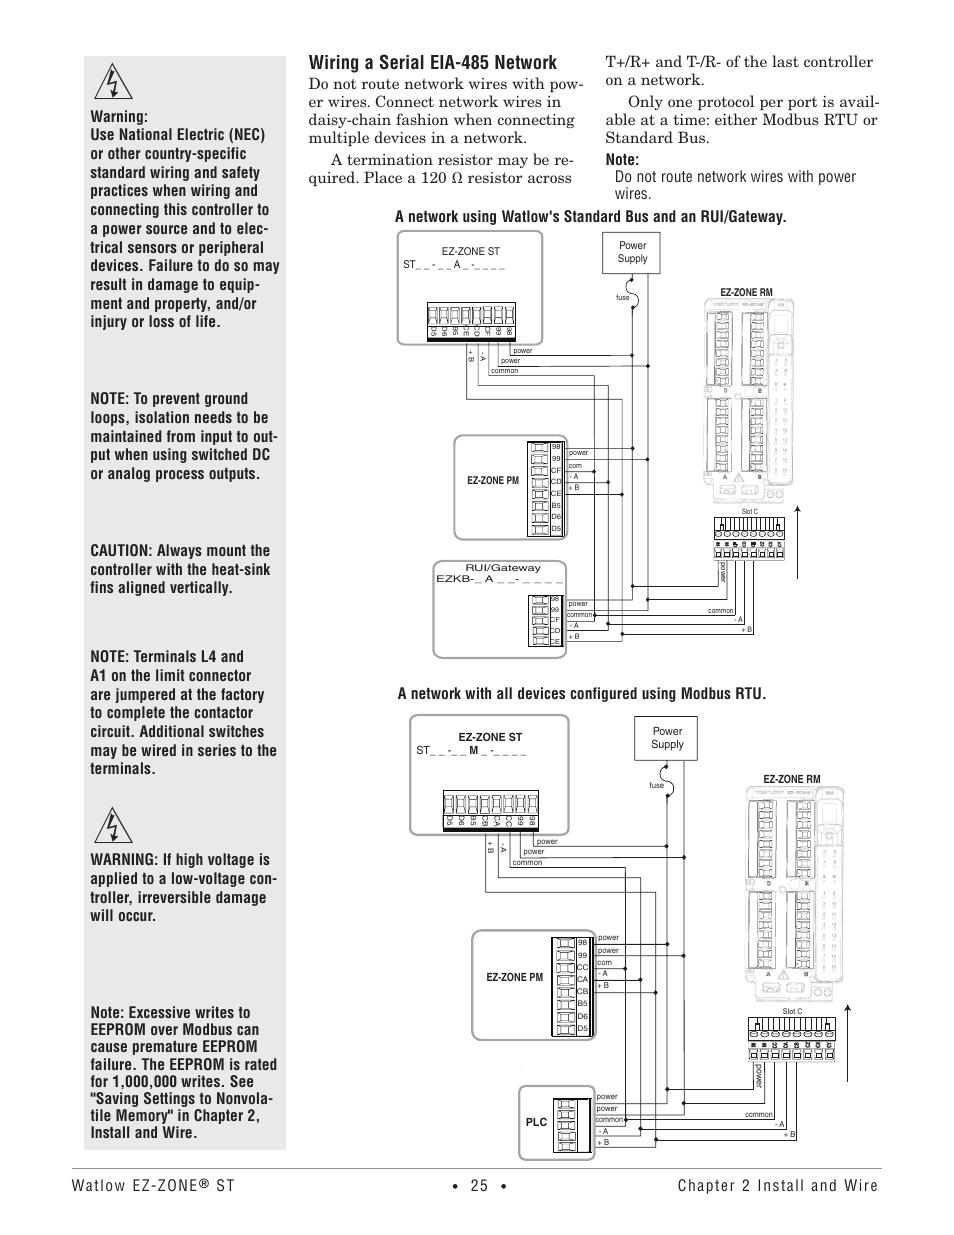 medium resolution of wiring a serial eia 485 network watlow ez zone st user manual watlow ez zone wiring diagram